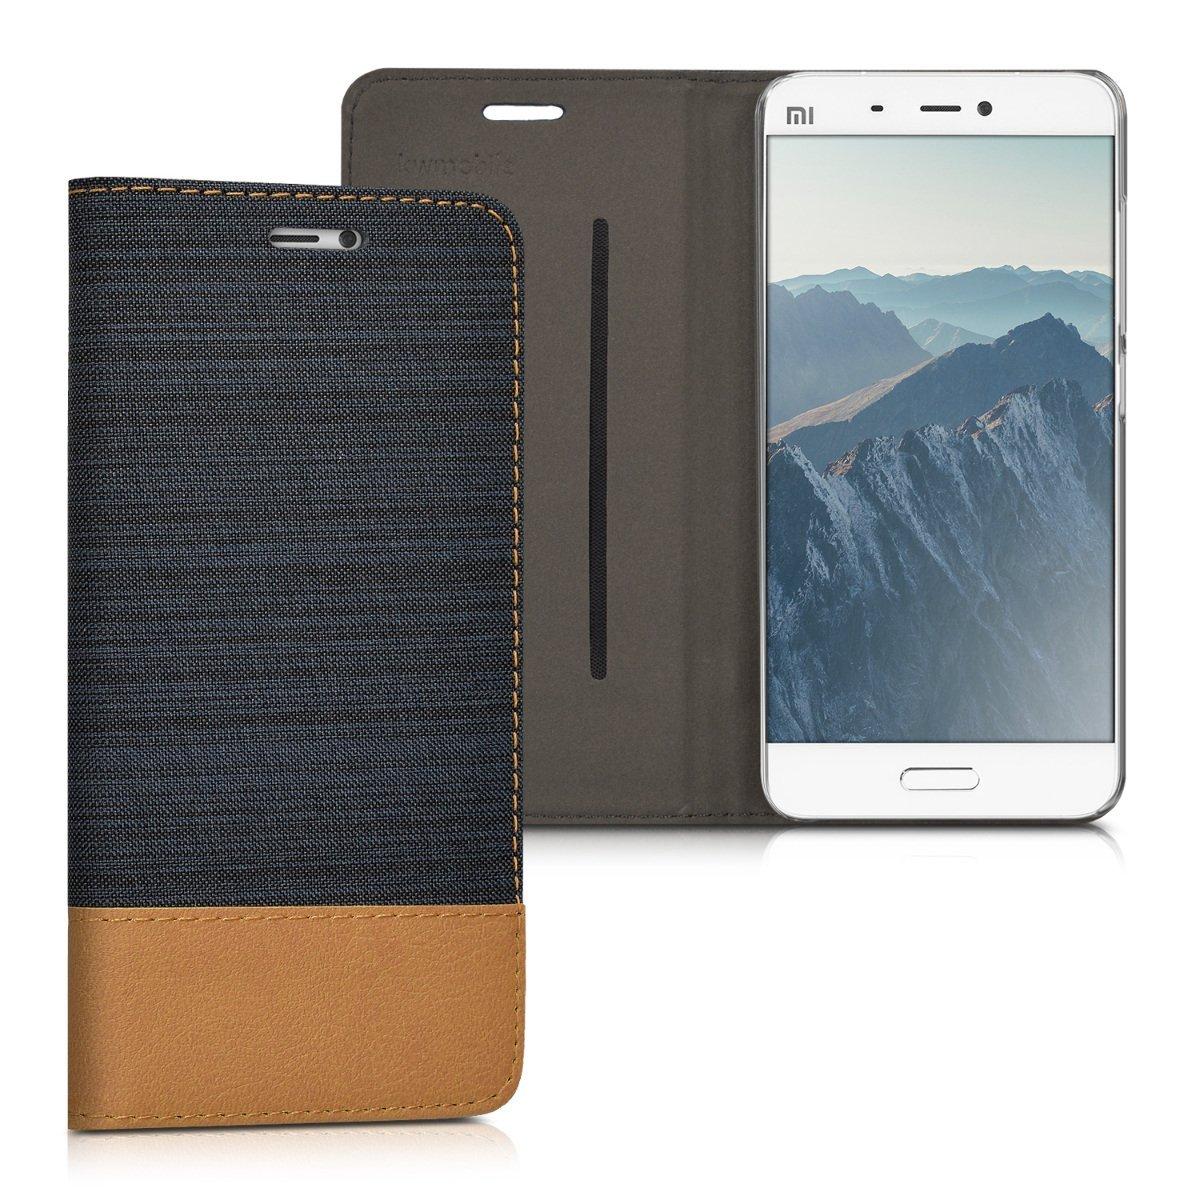 KW Θήκη - Πορτοφόλι Xiaomi Mi 5 - Dark Blue/ Brown (38215.17)